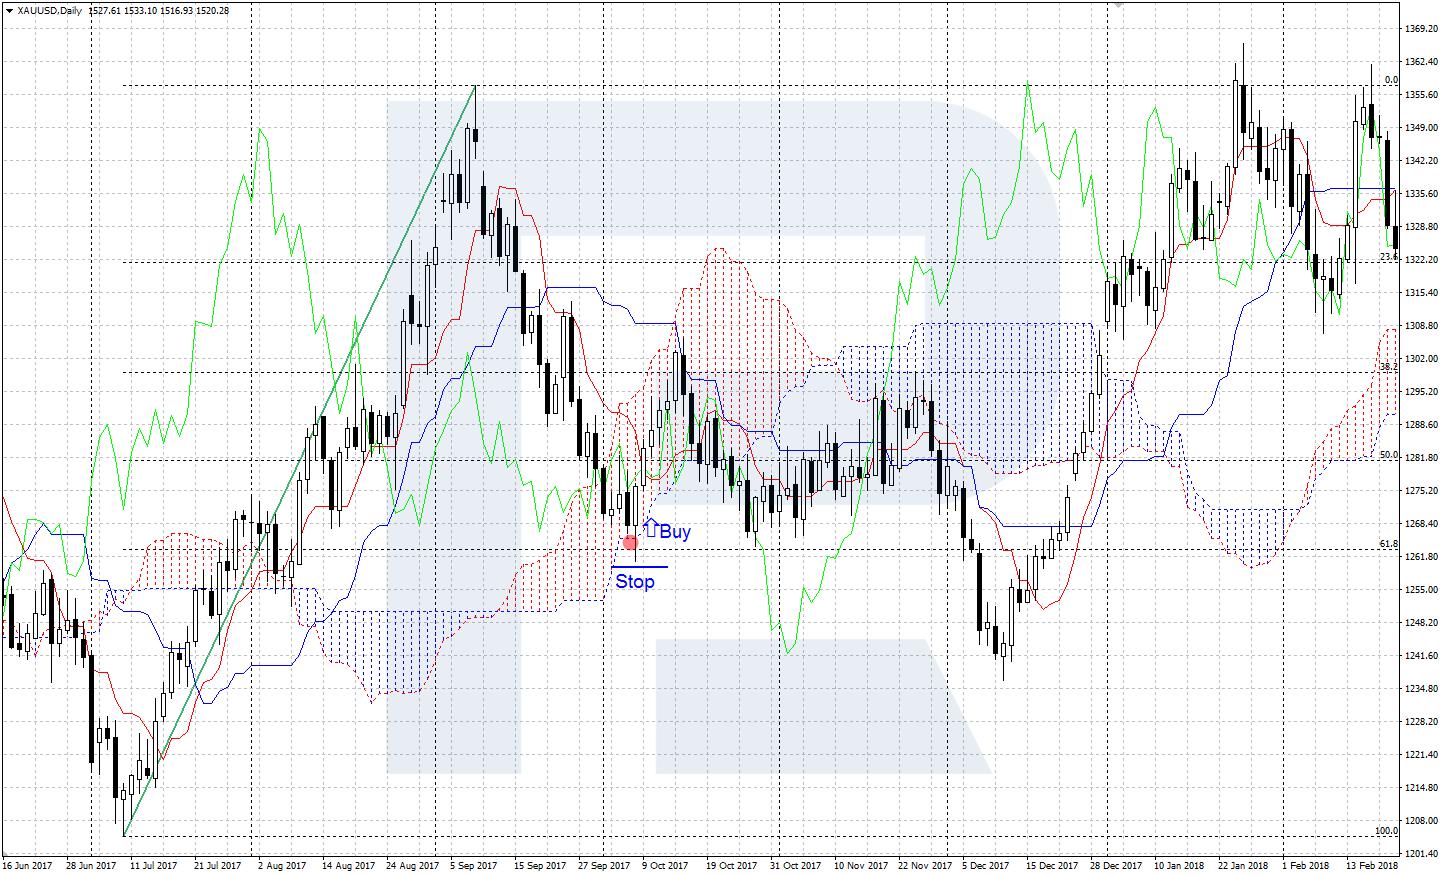 Fibonači līniju stratēģija, izmantojot indikatoru